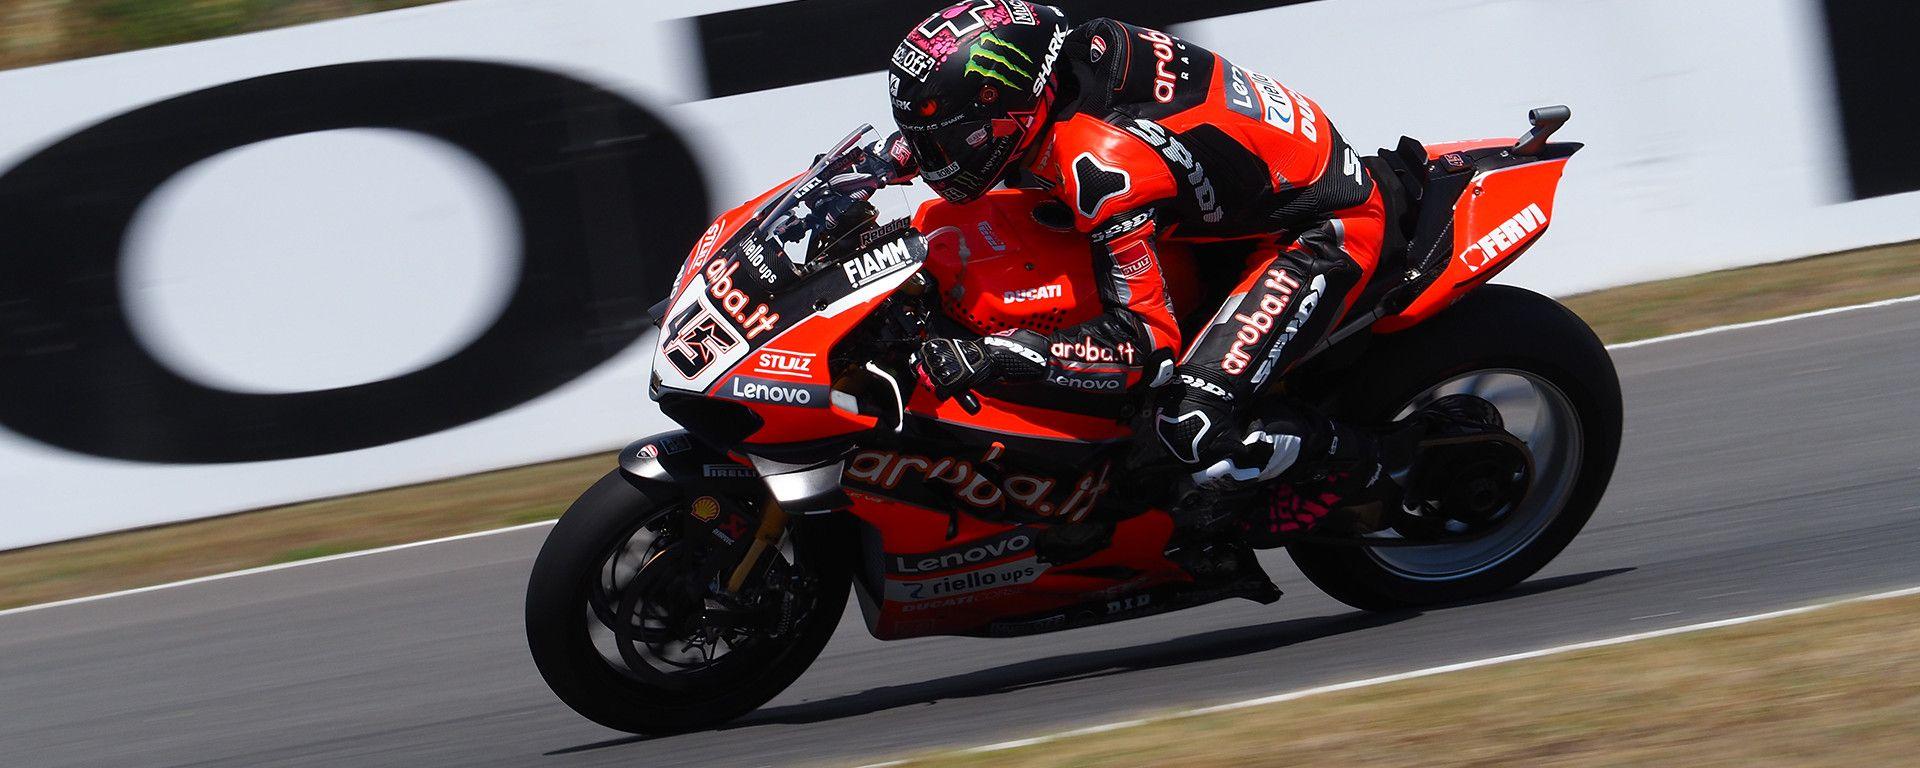 WorldSBK 2021, round Estoril: Scott Redding (Ducati)